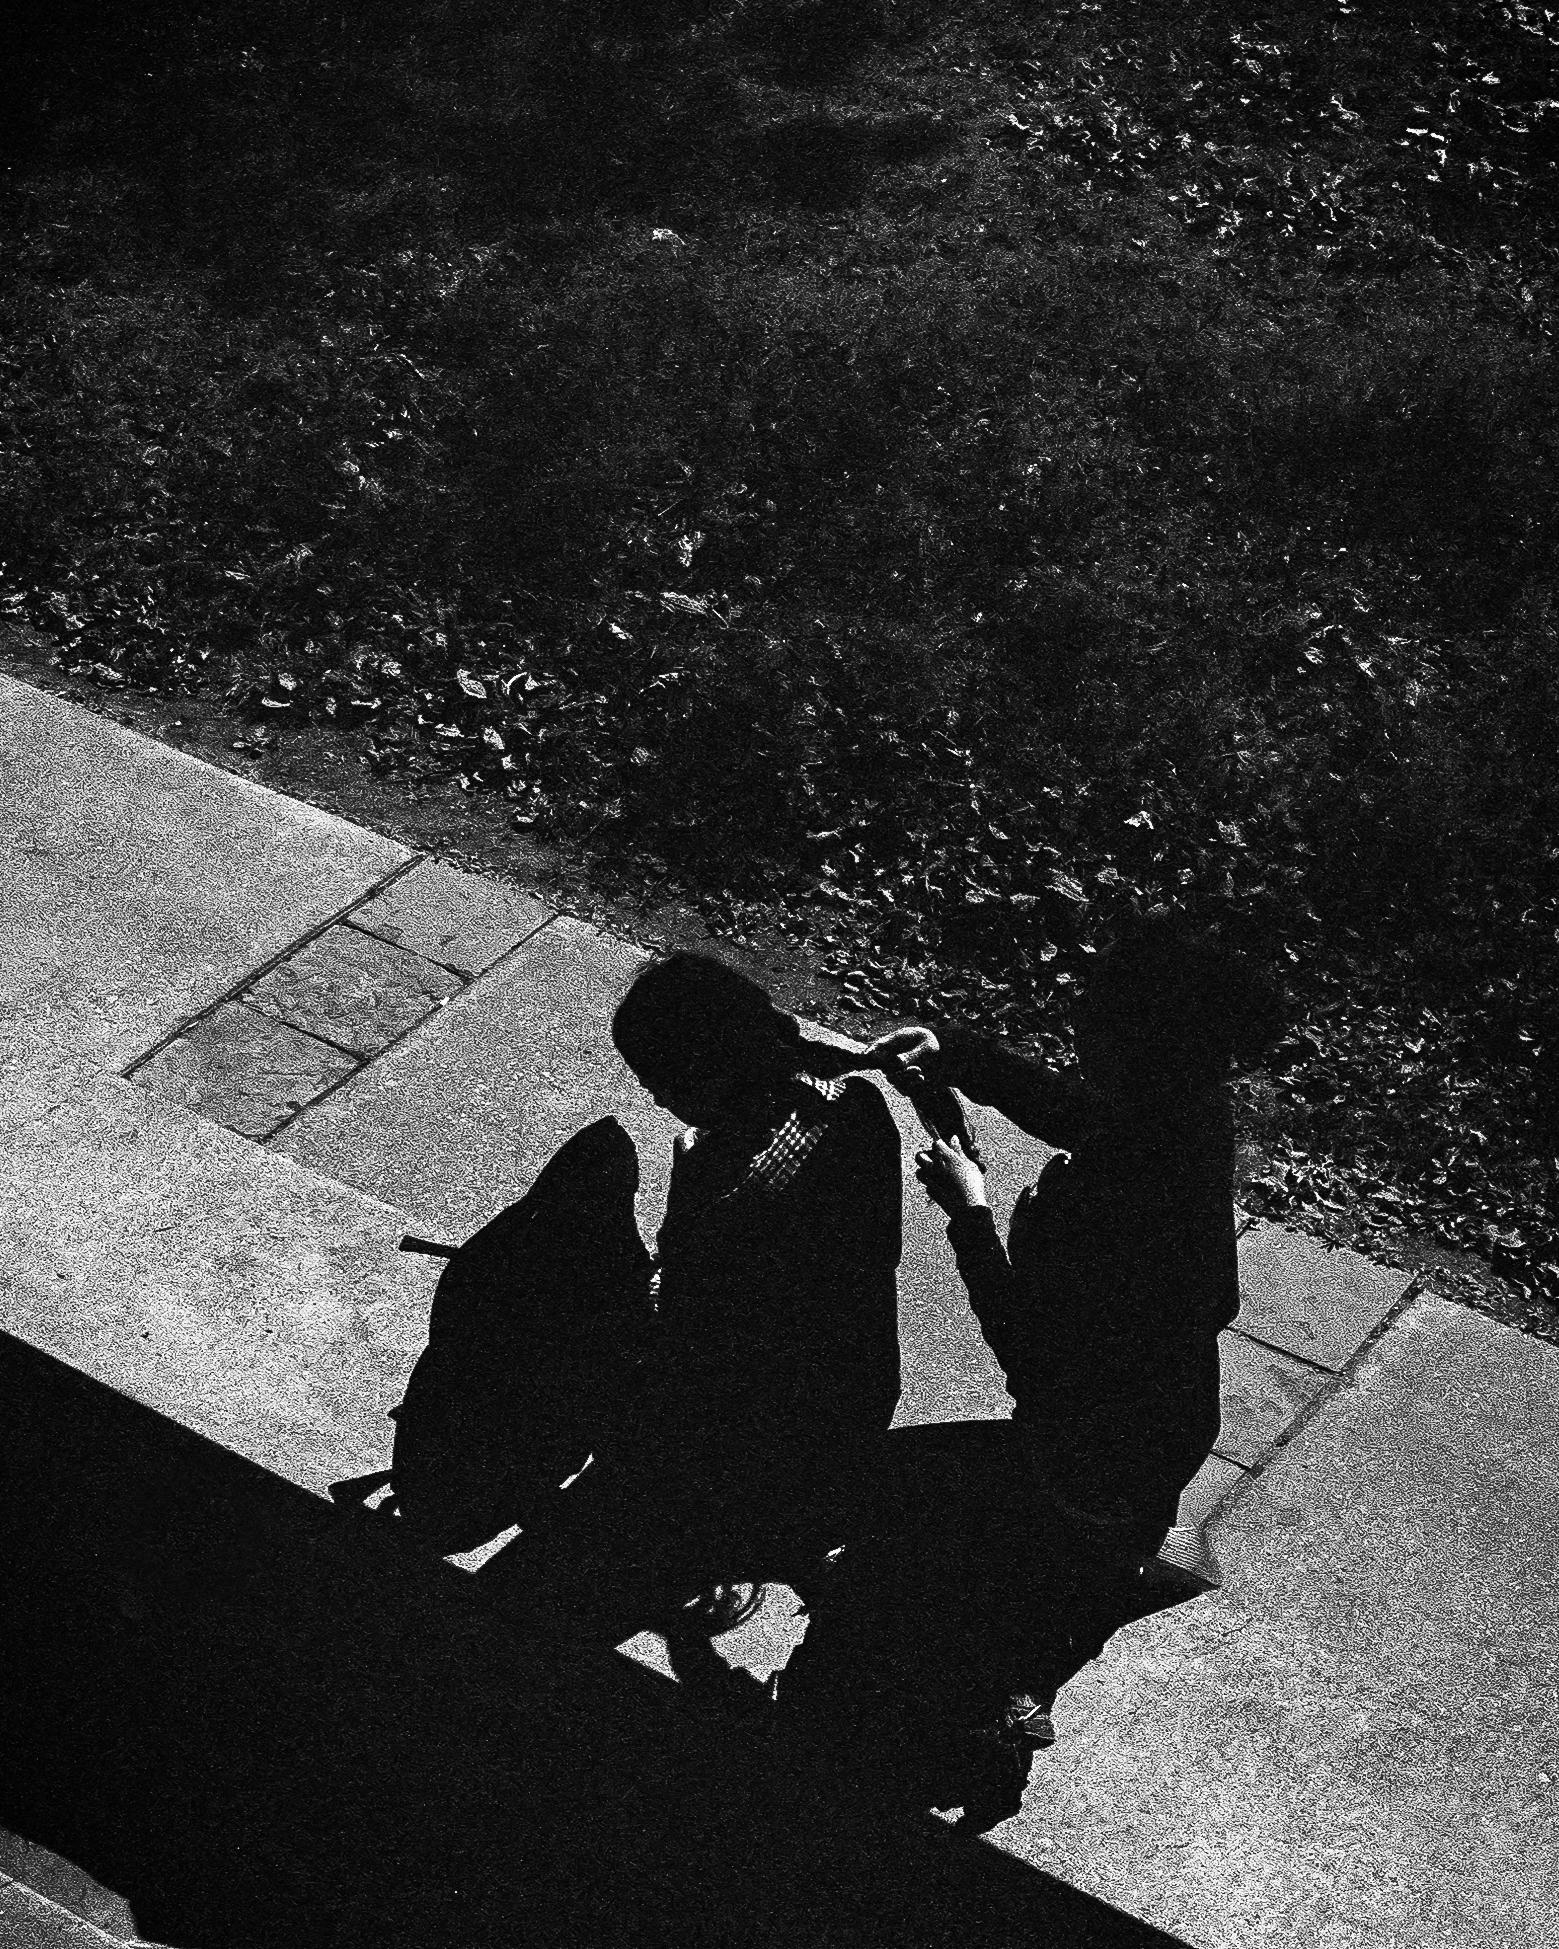 In Shadows 5 by Sebastien Duff-Maill